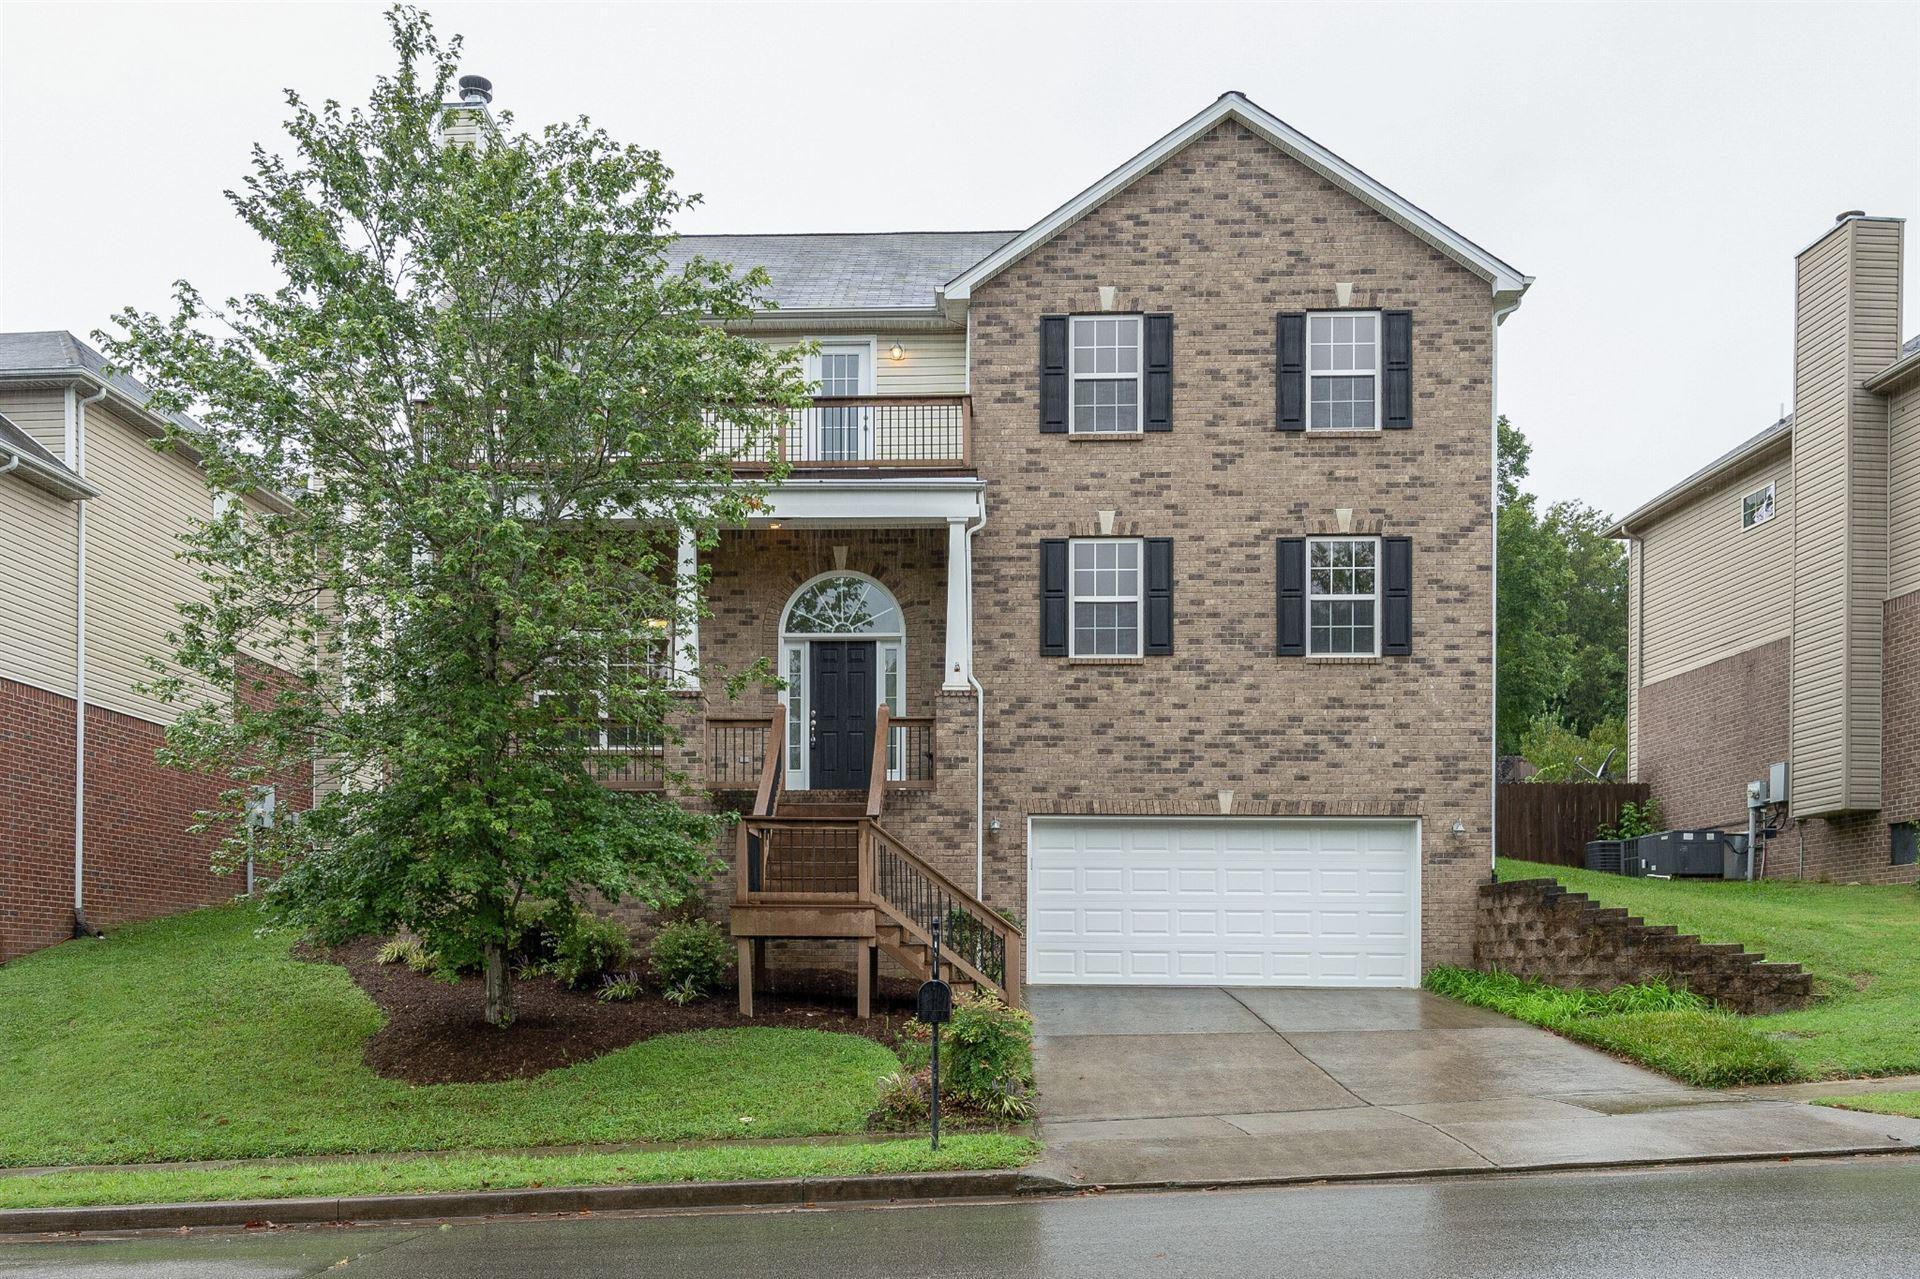 1517 Constitution Ave, Nashville, TN 37207 - MLS#: 2292770